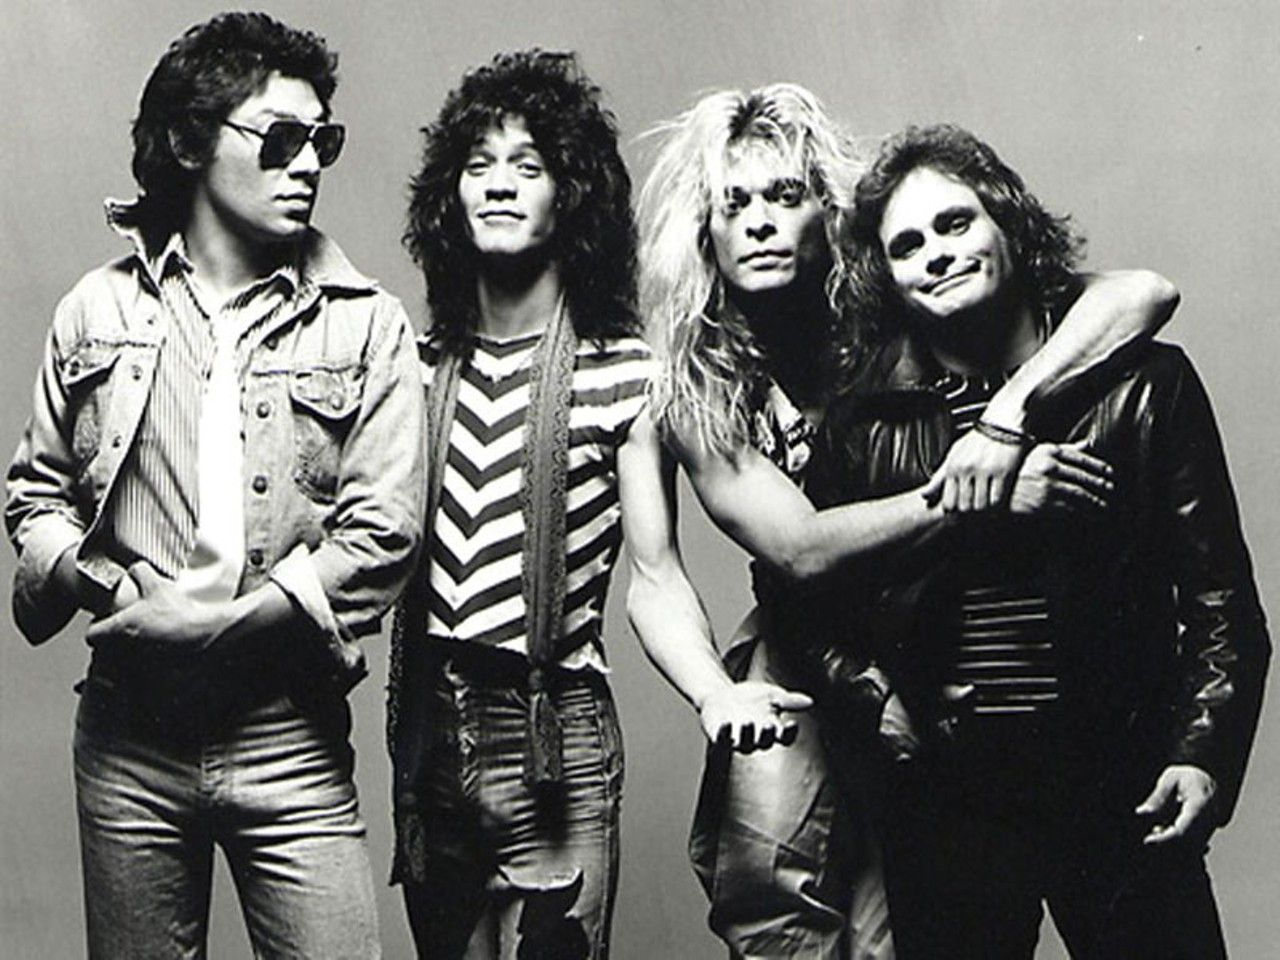 Ah Precious Sweetheart Woman All You Want Is Good As It Can Get Oh Yeah An Inspiration Girl You Re Sensational A Alex Van Halen Van Halen Eddie Van Halen